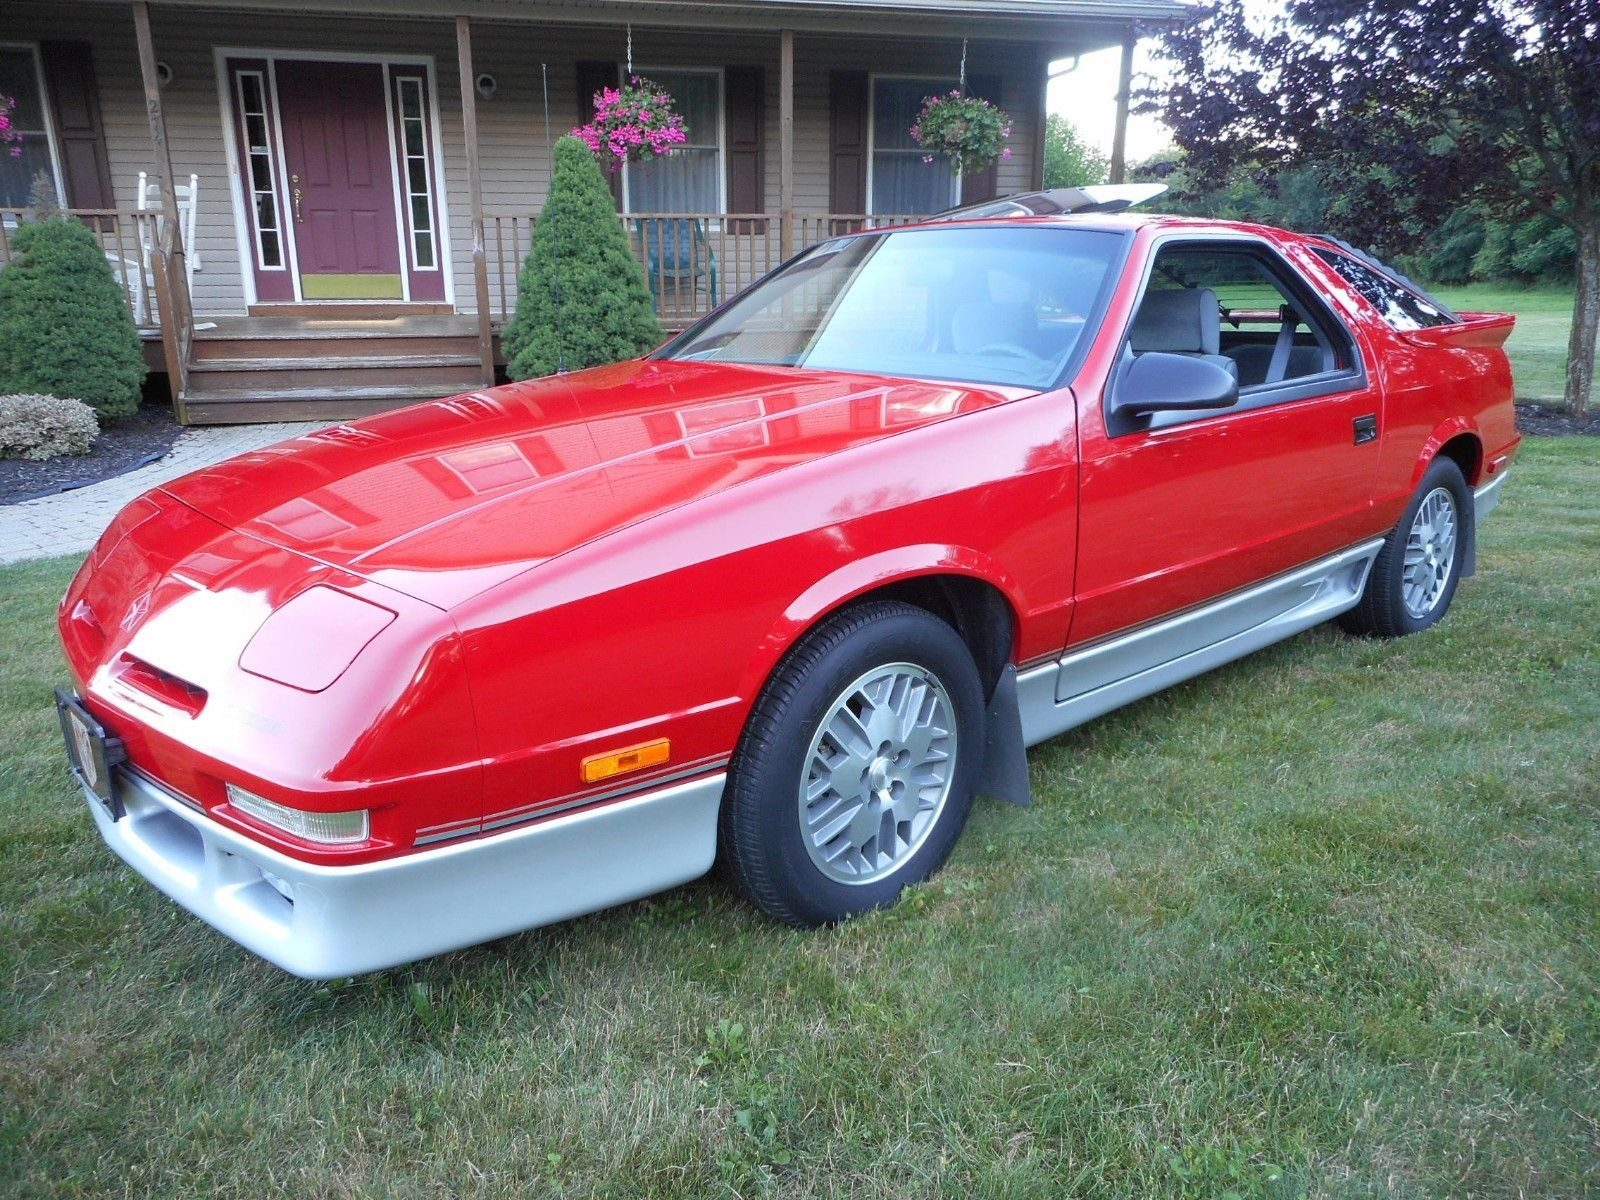 2 059 Original Miles 1989 Dodge Daytona